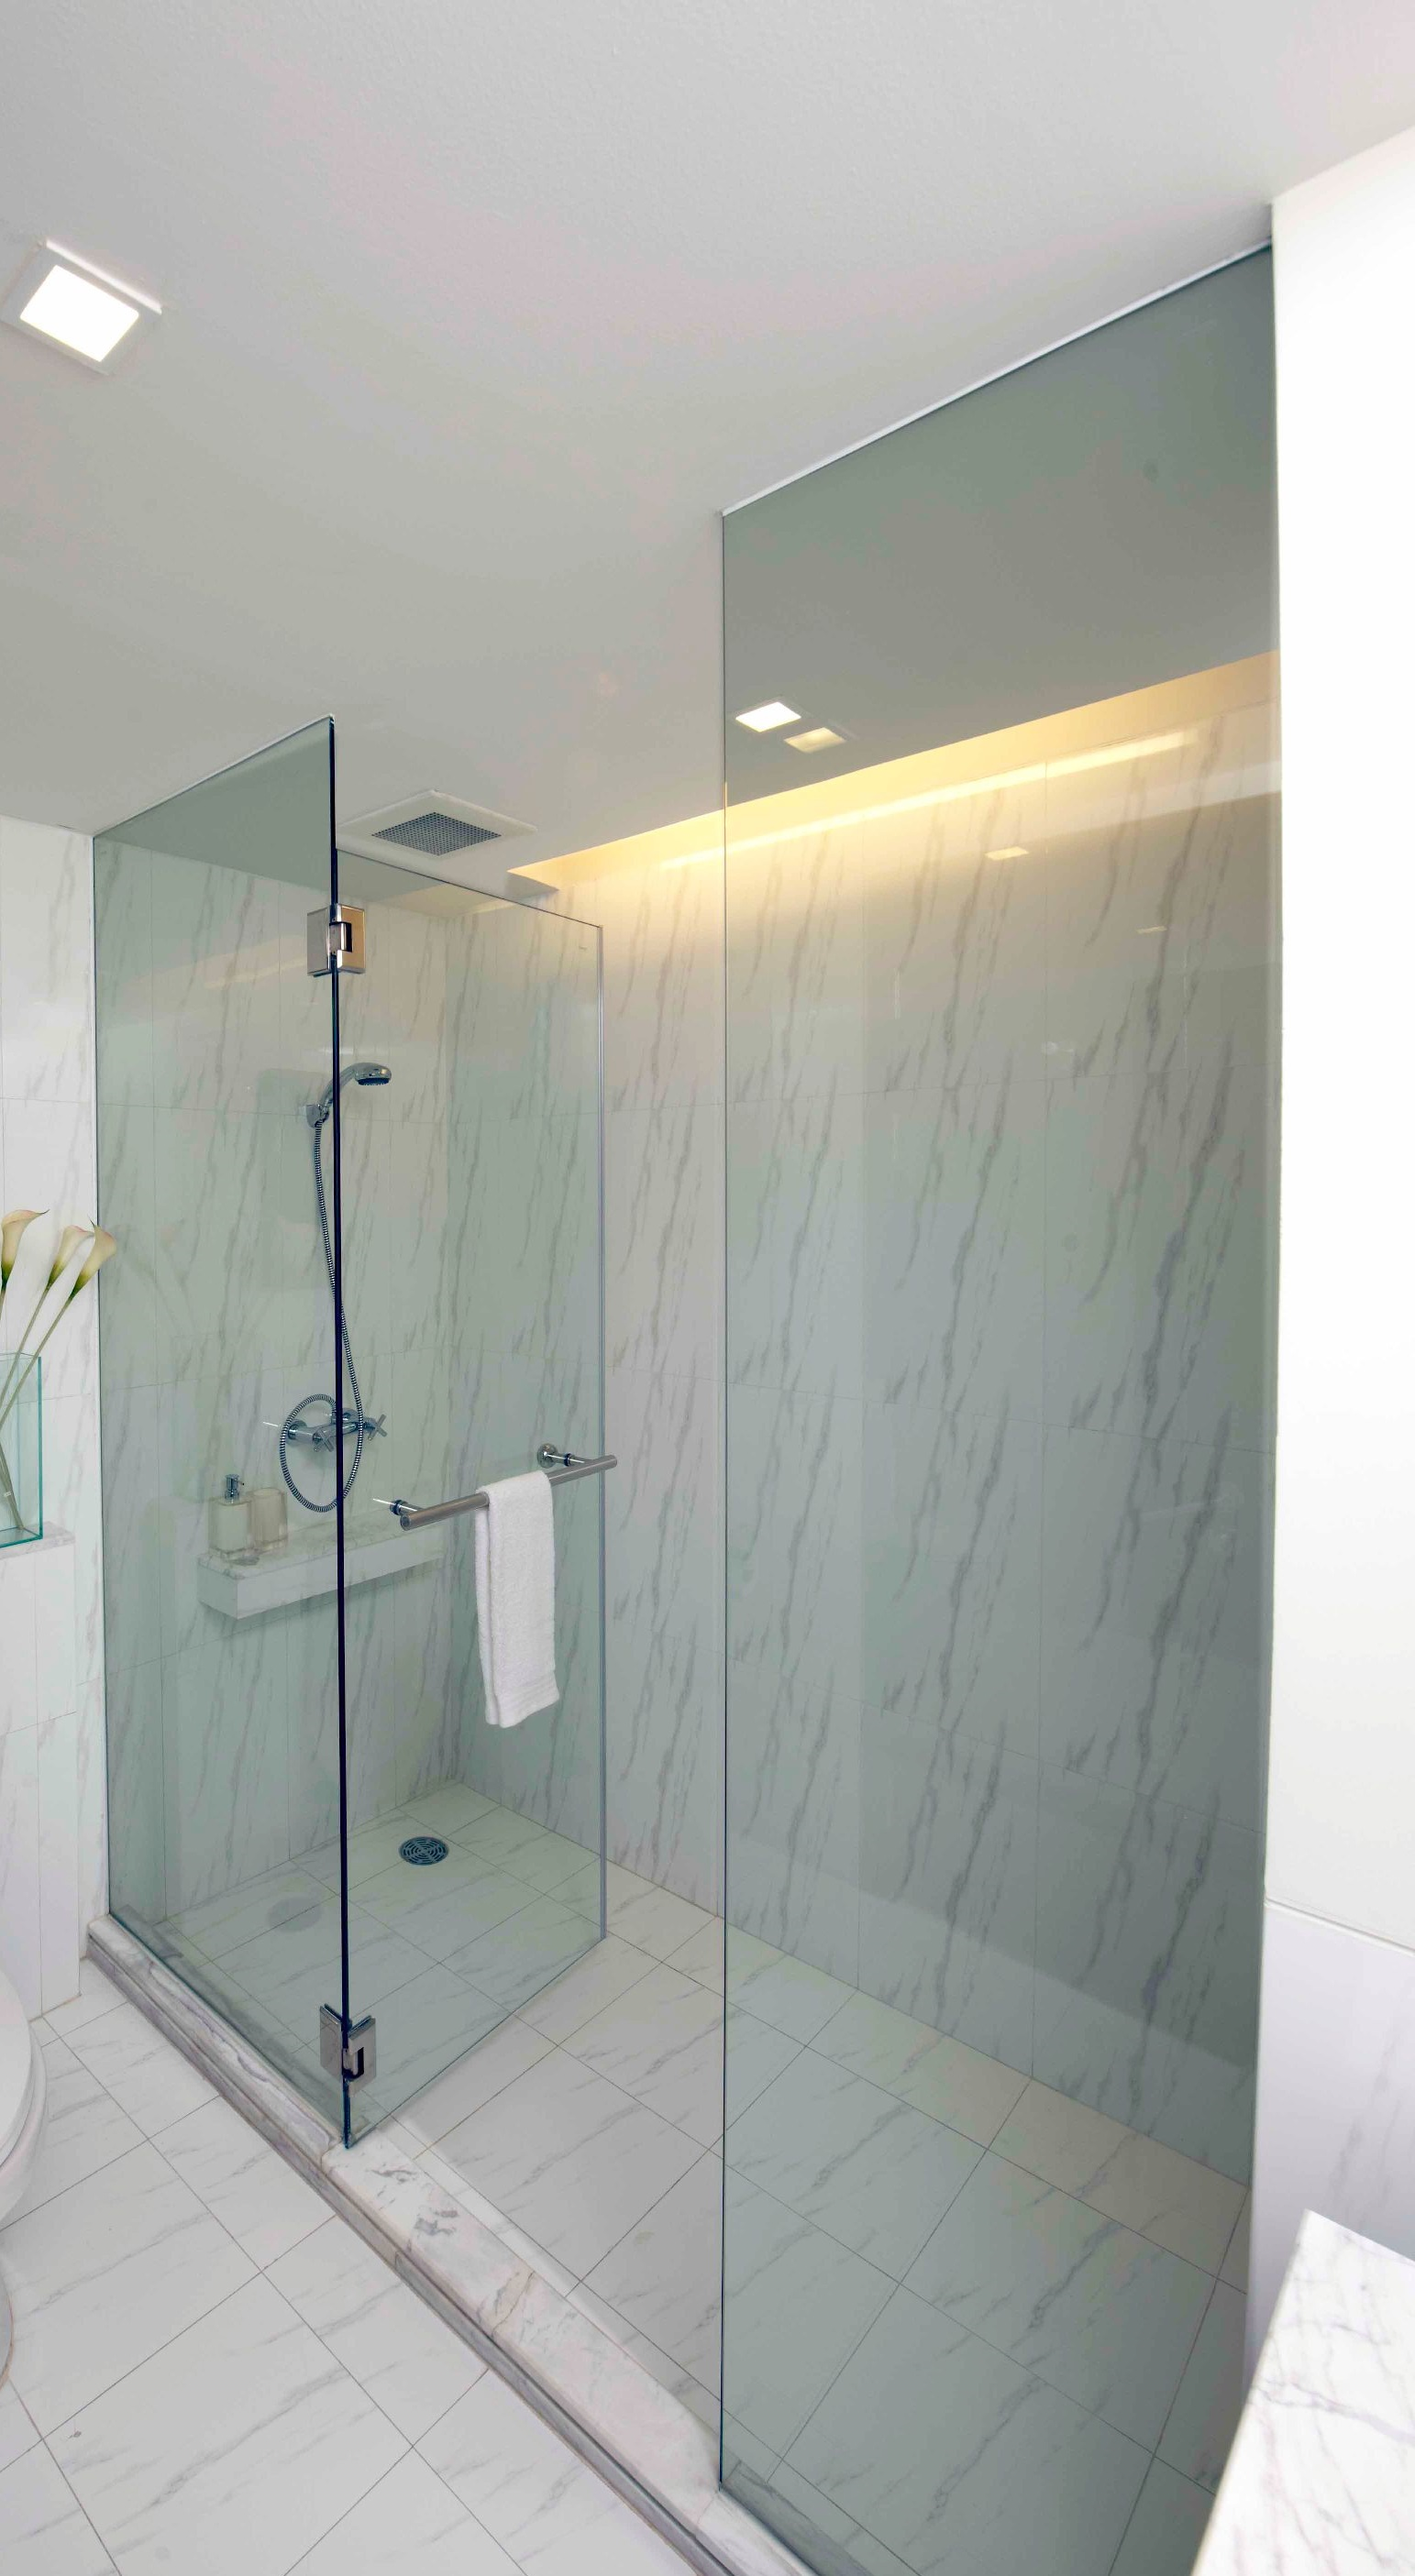 DBC090-GS Frameless Shower Enclosure Opening door (B-Hinge) 10 mm ...